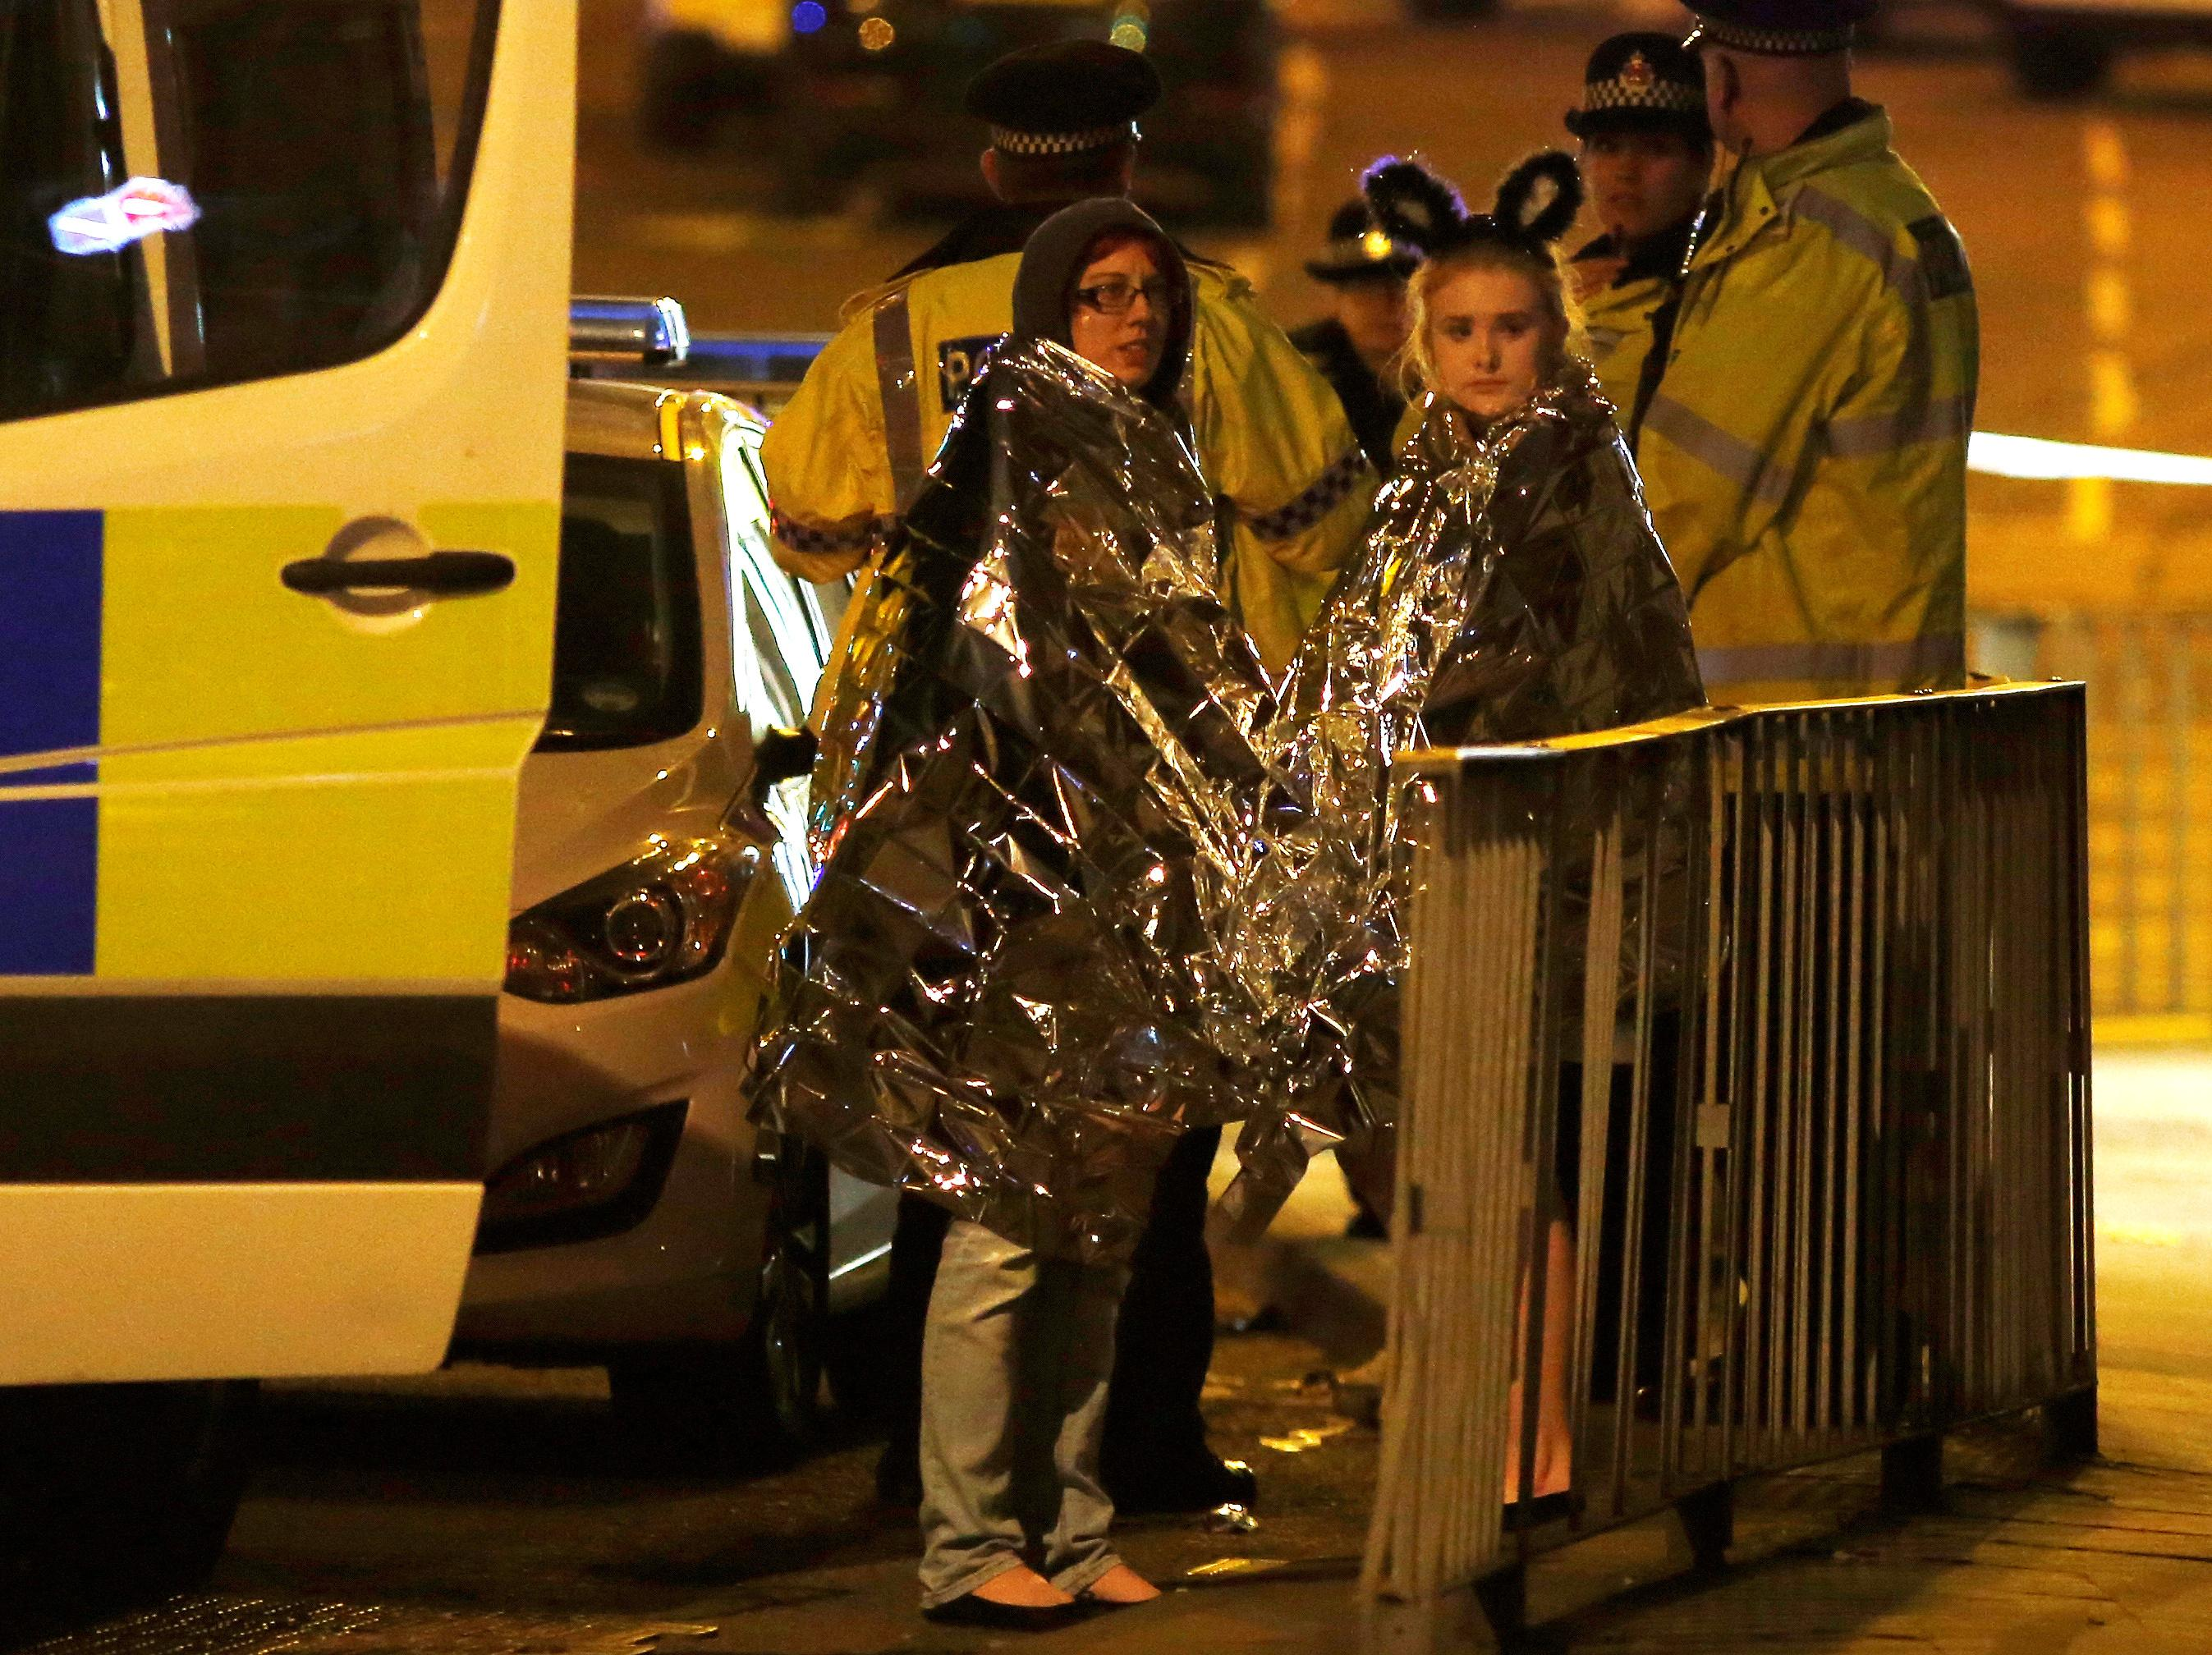 UK arrests Manchester bomber's brother after Libya extradition